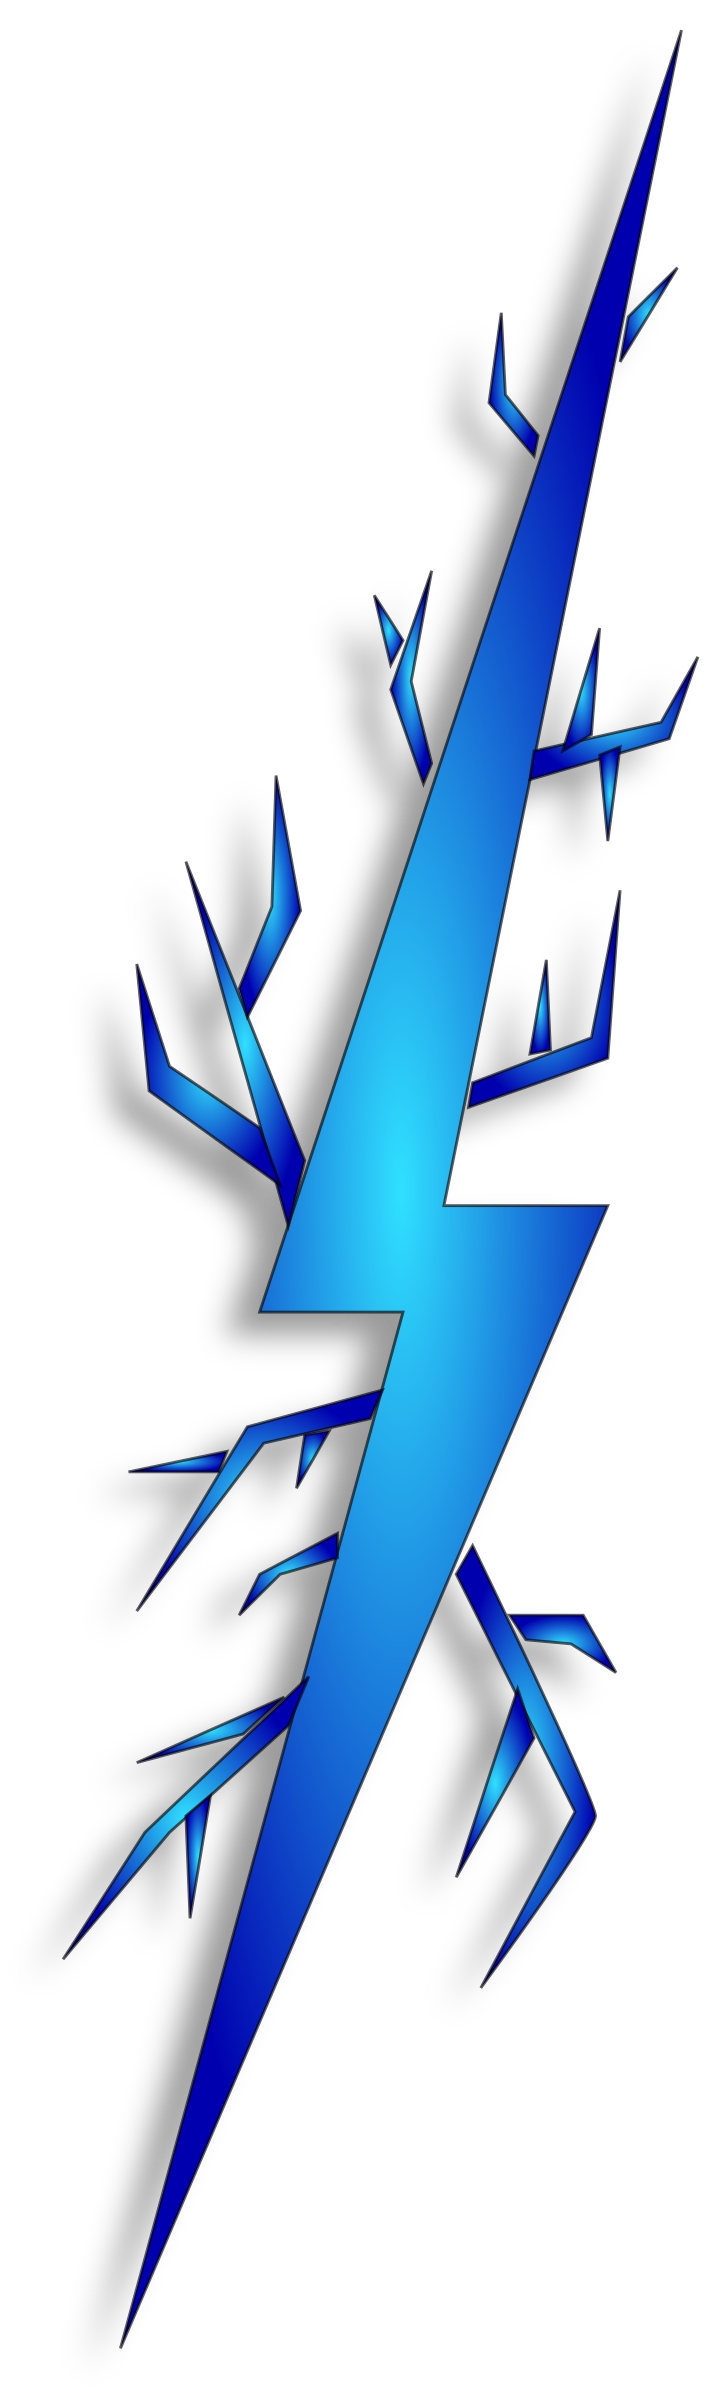 Lightning bolt image clipart .